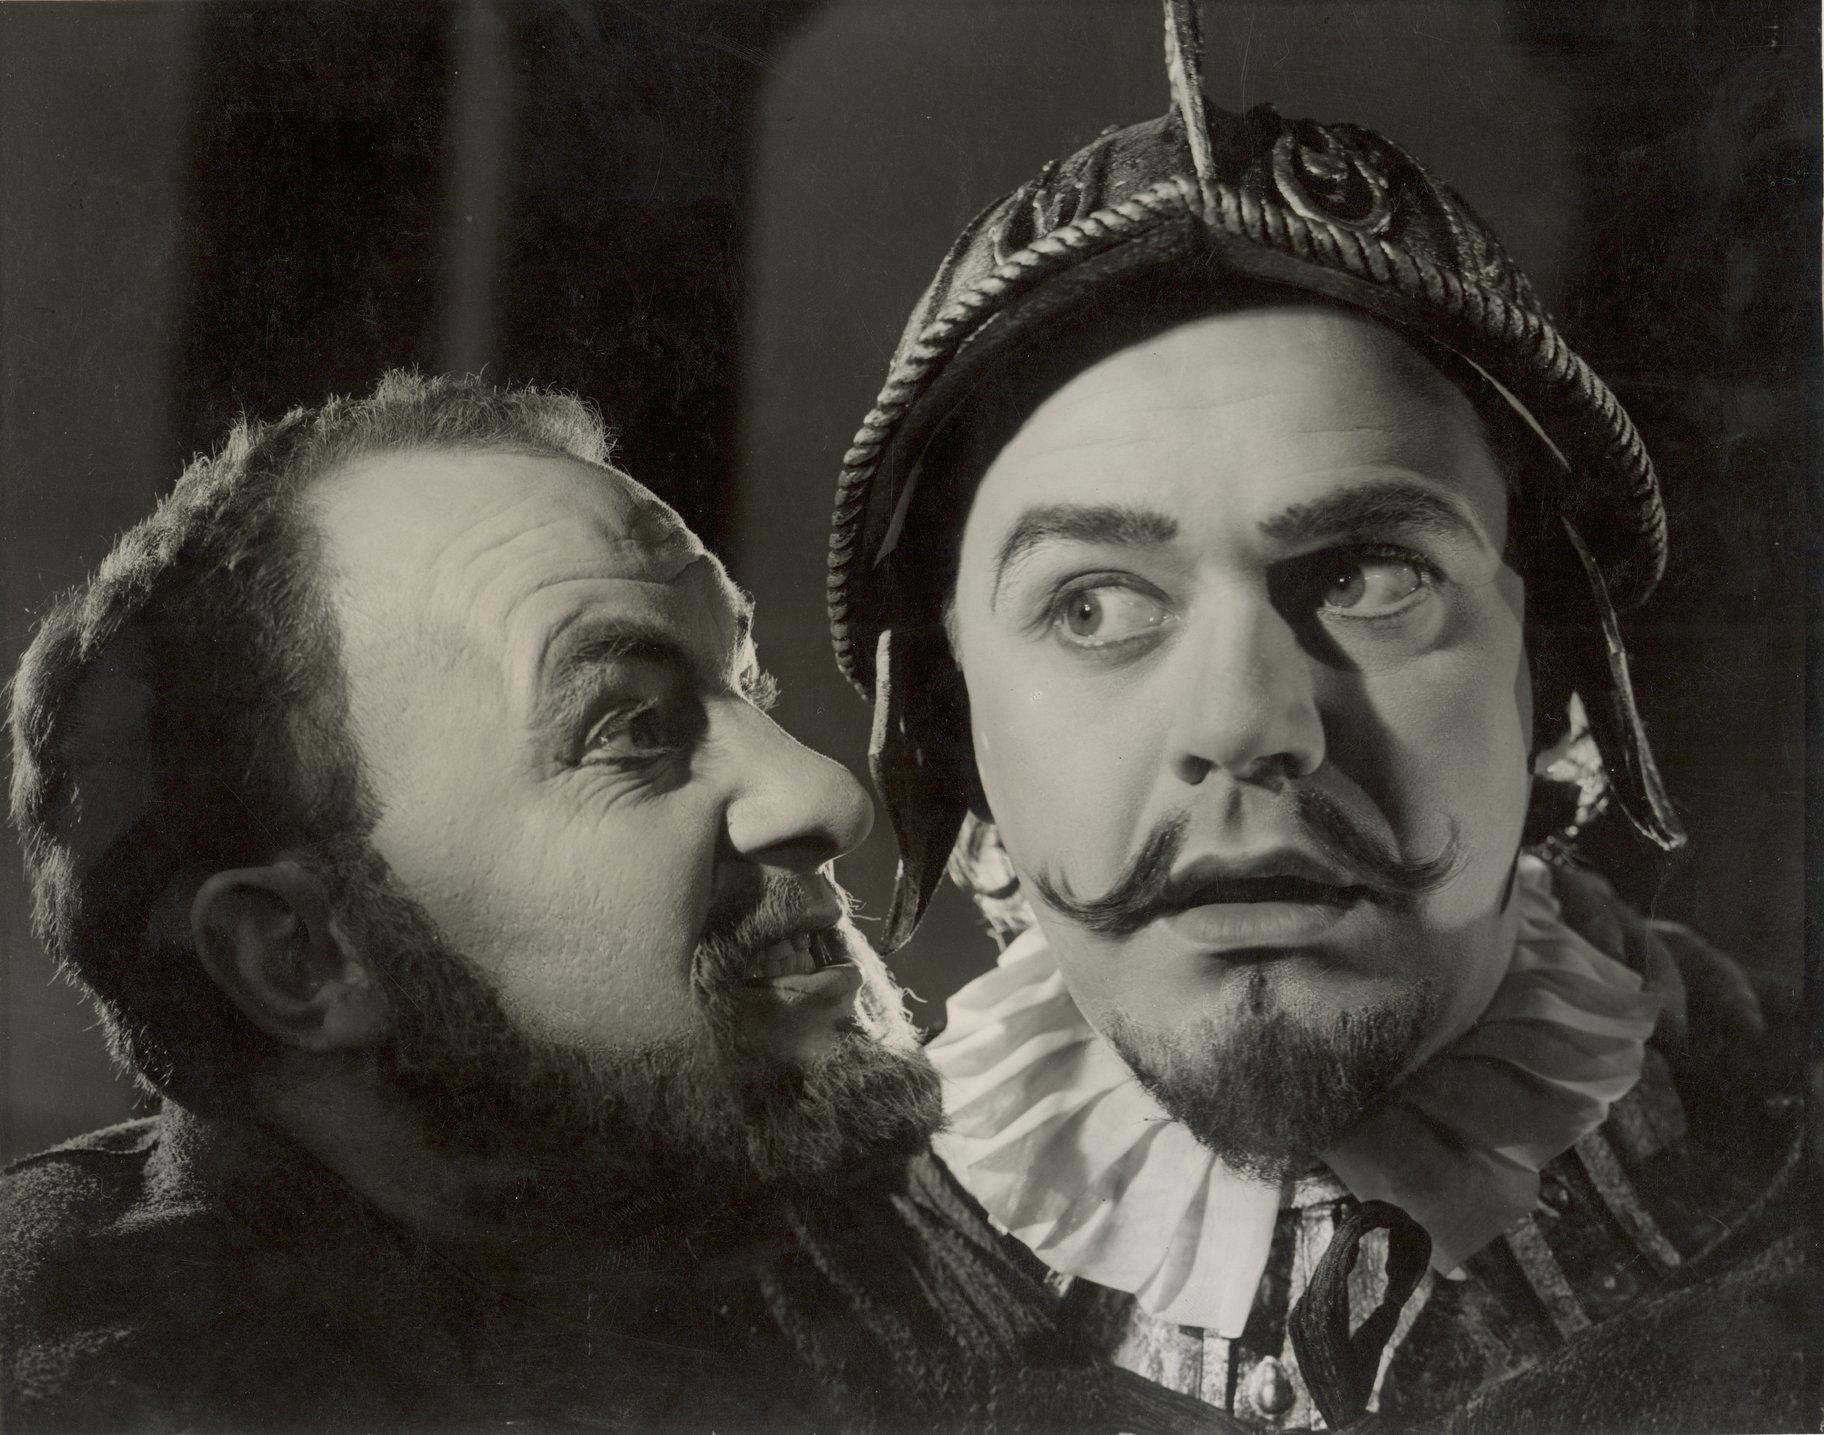 Iago manipulates Roderigo.